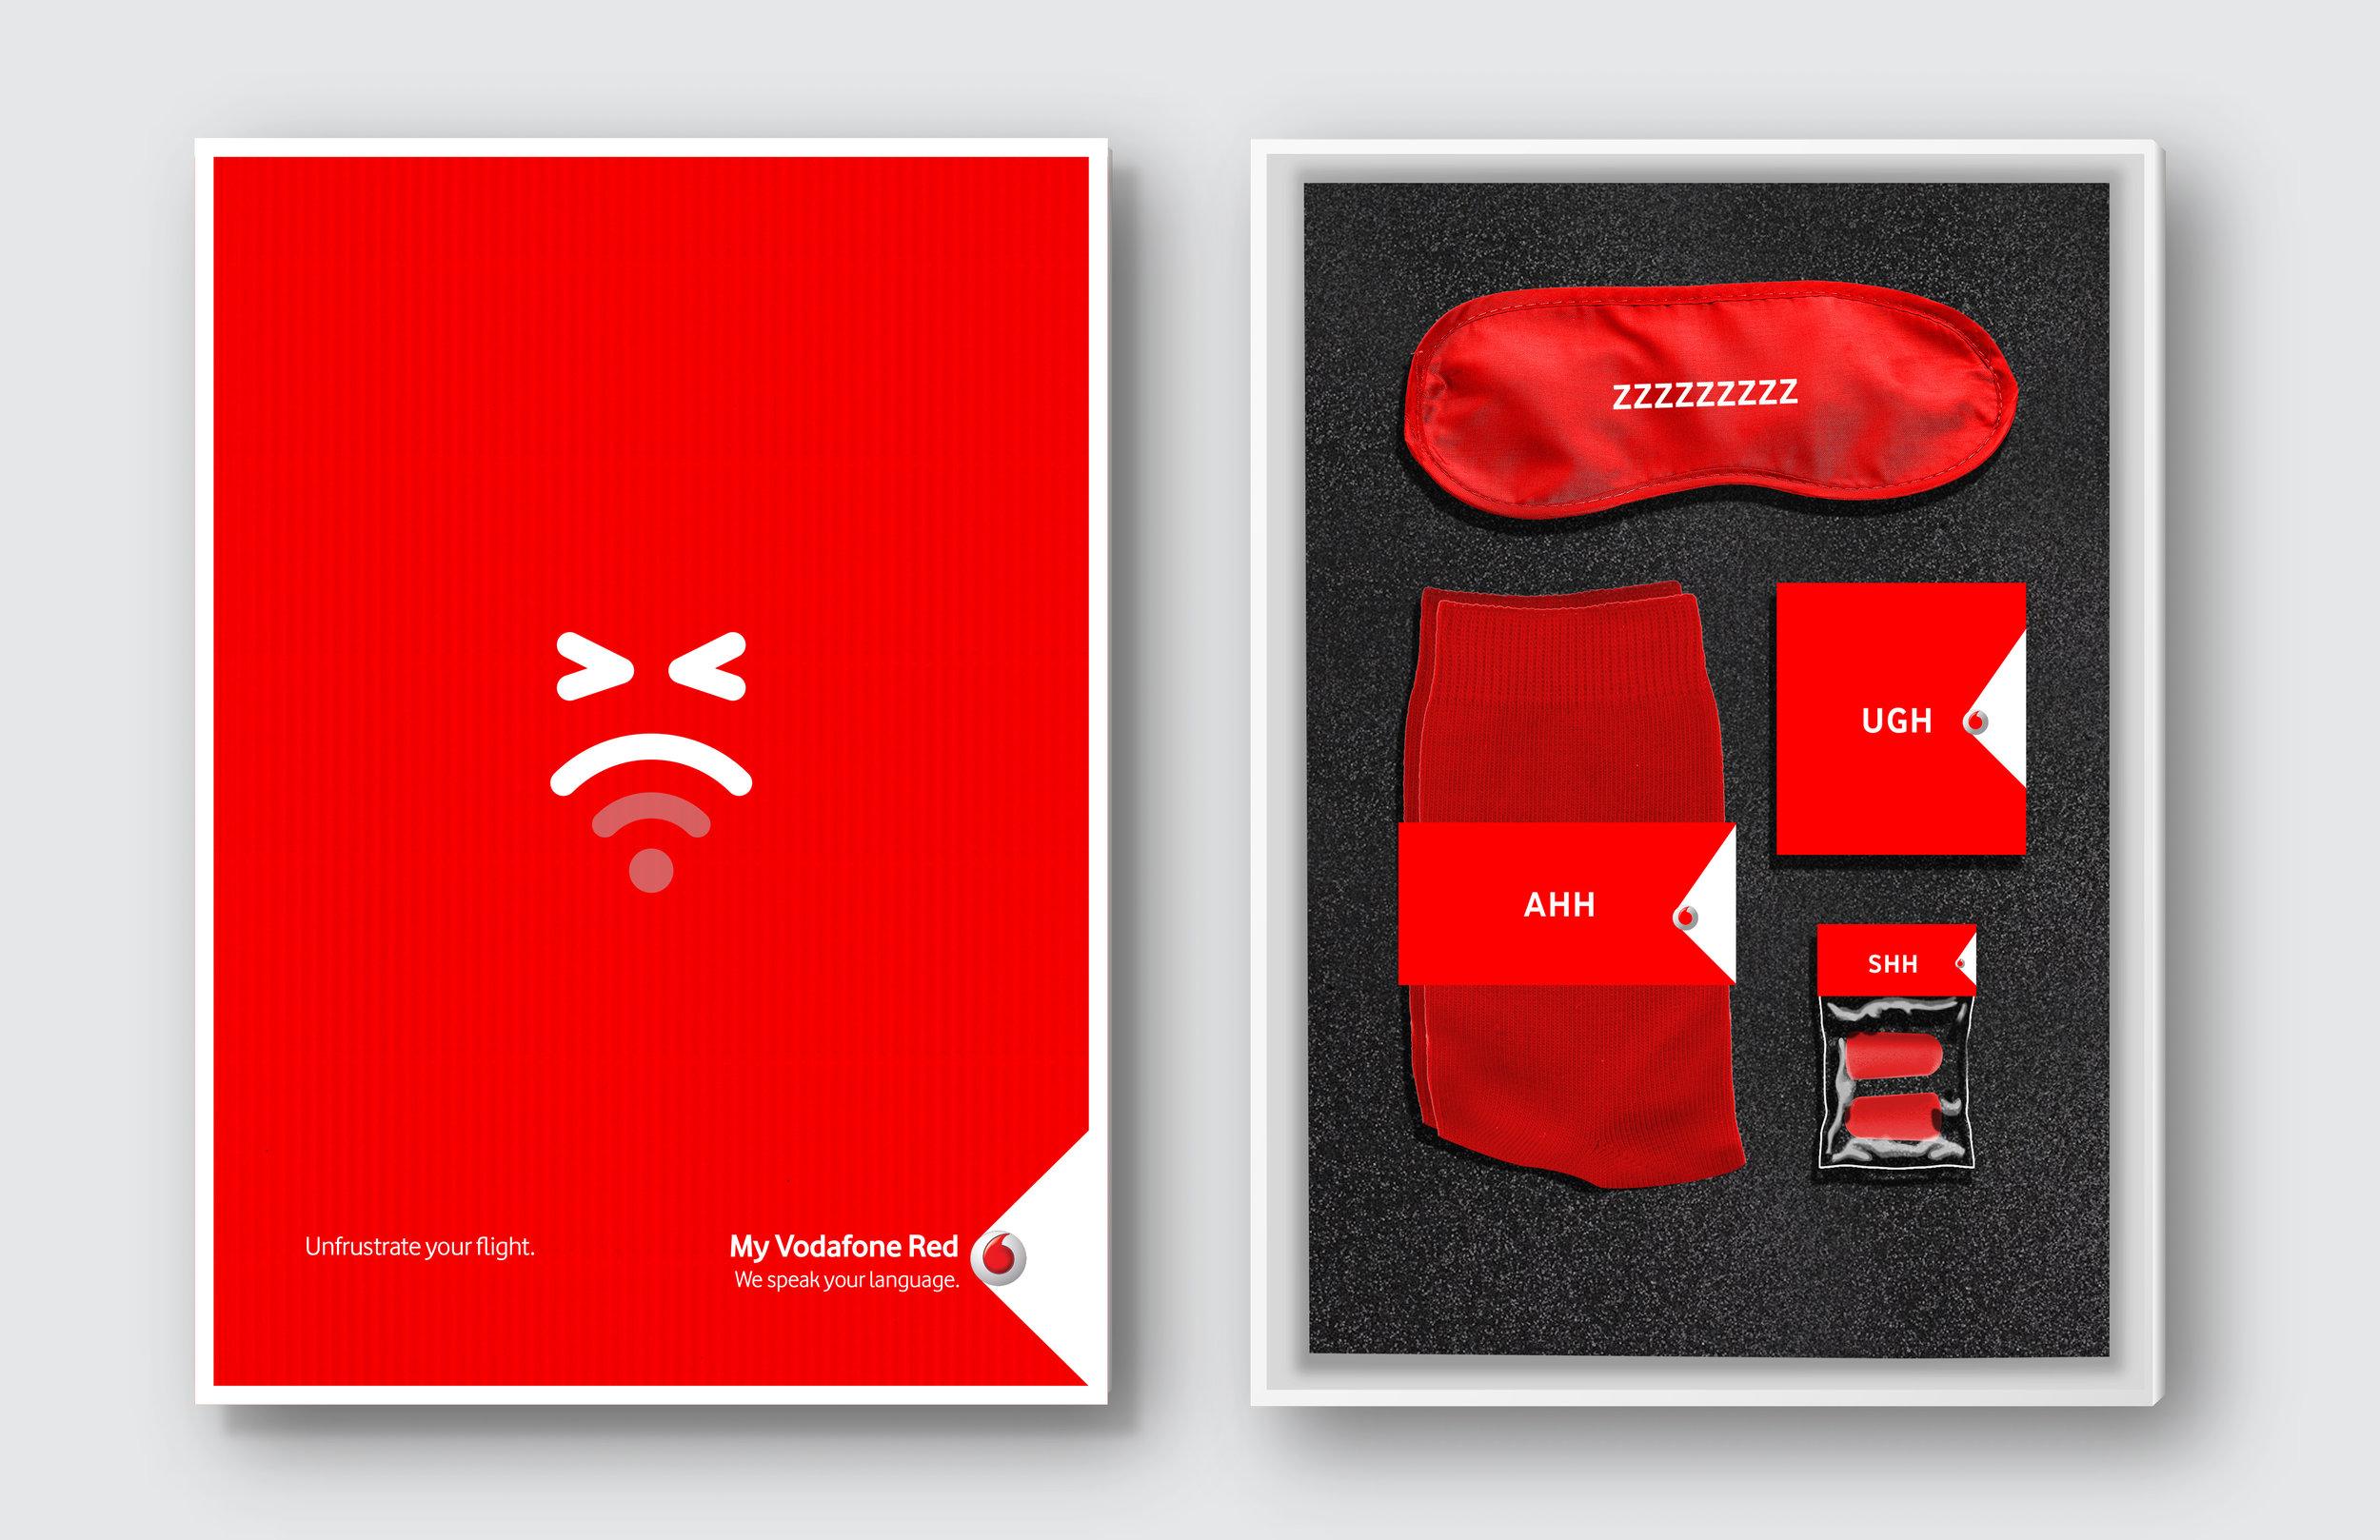 Web_Vodafone_Page_11.jpg